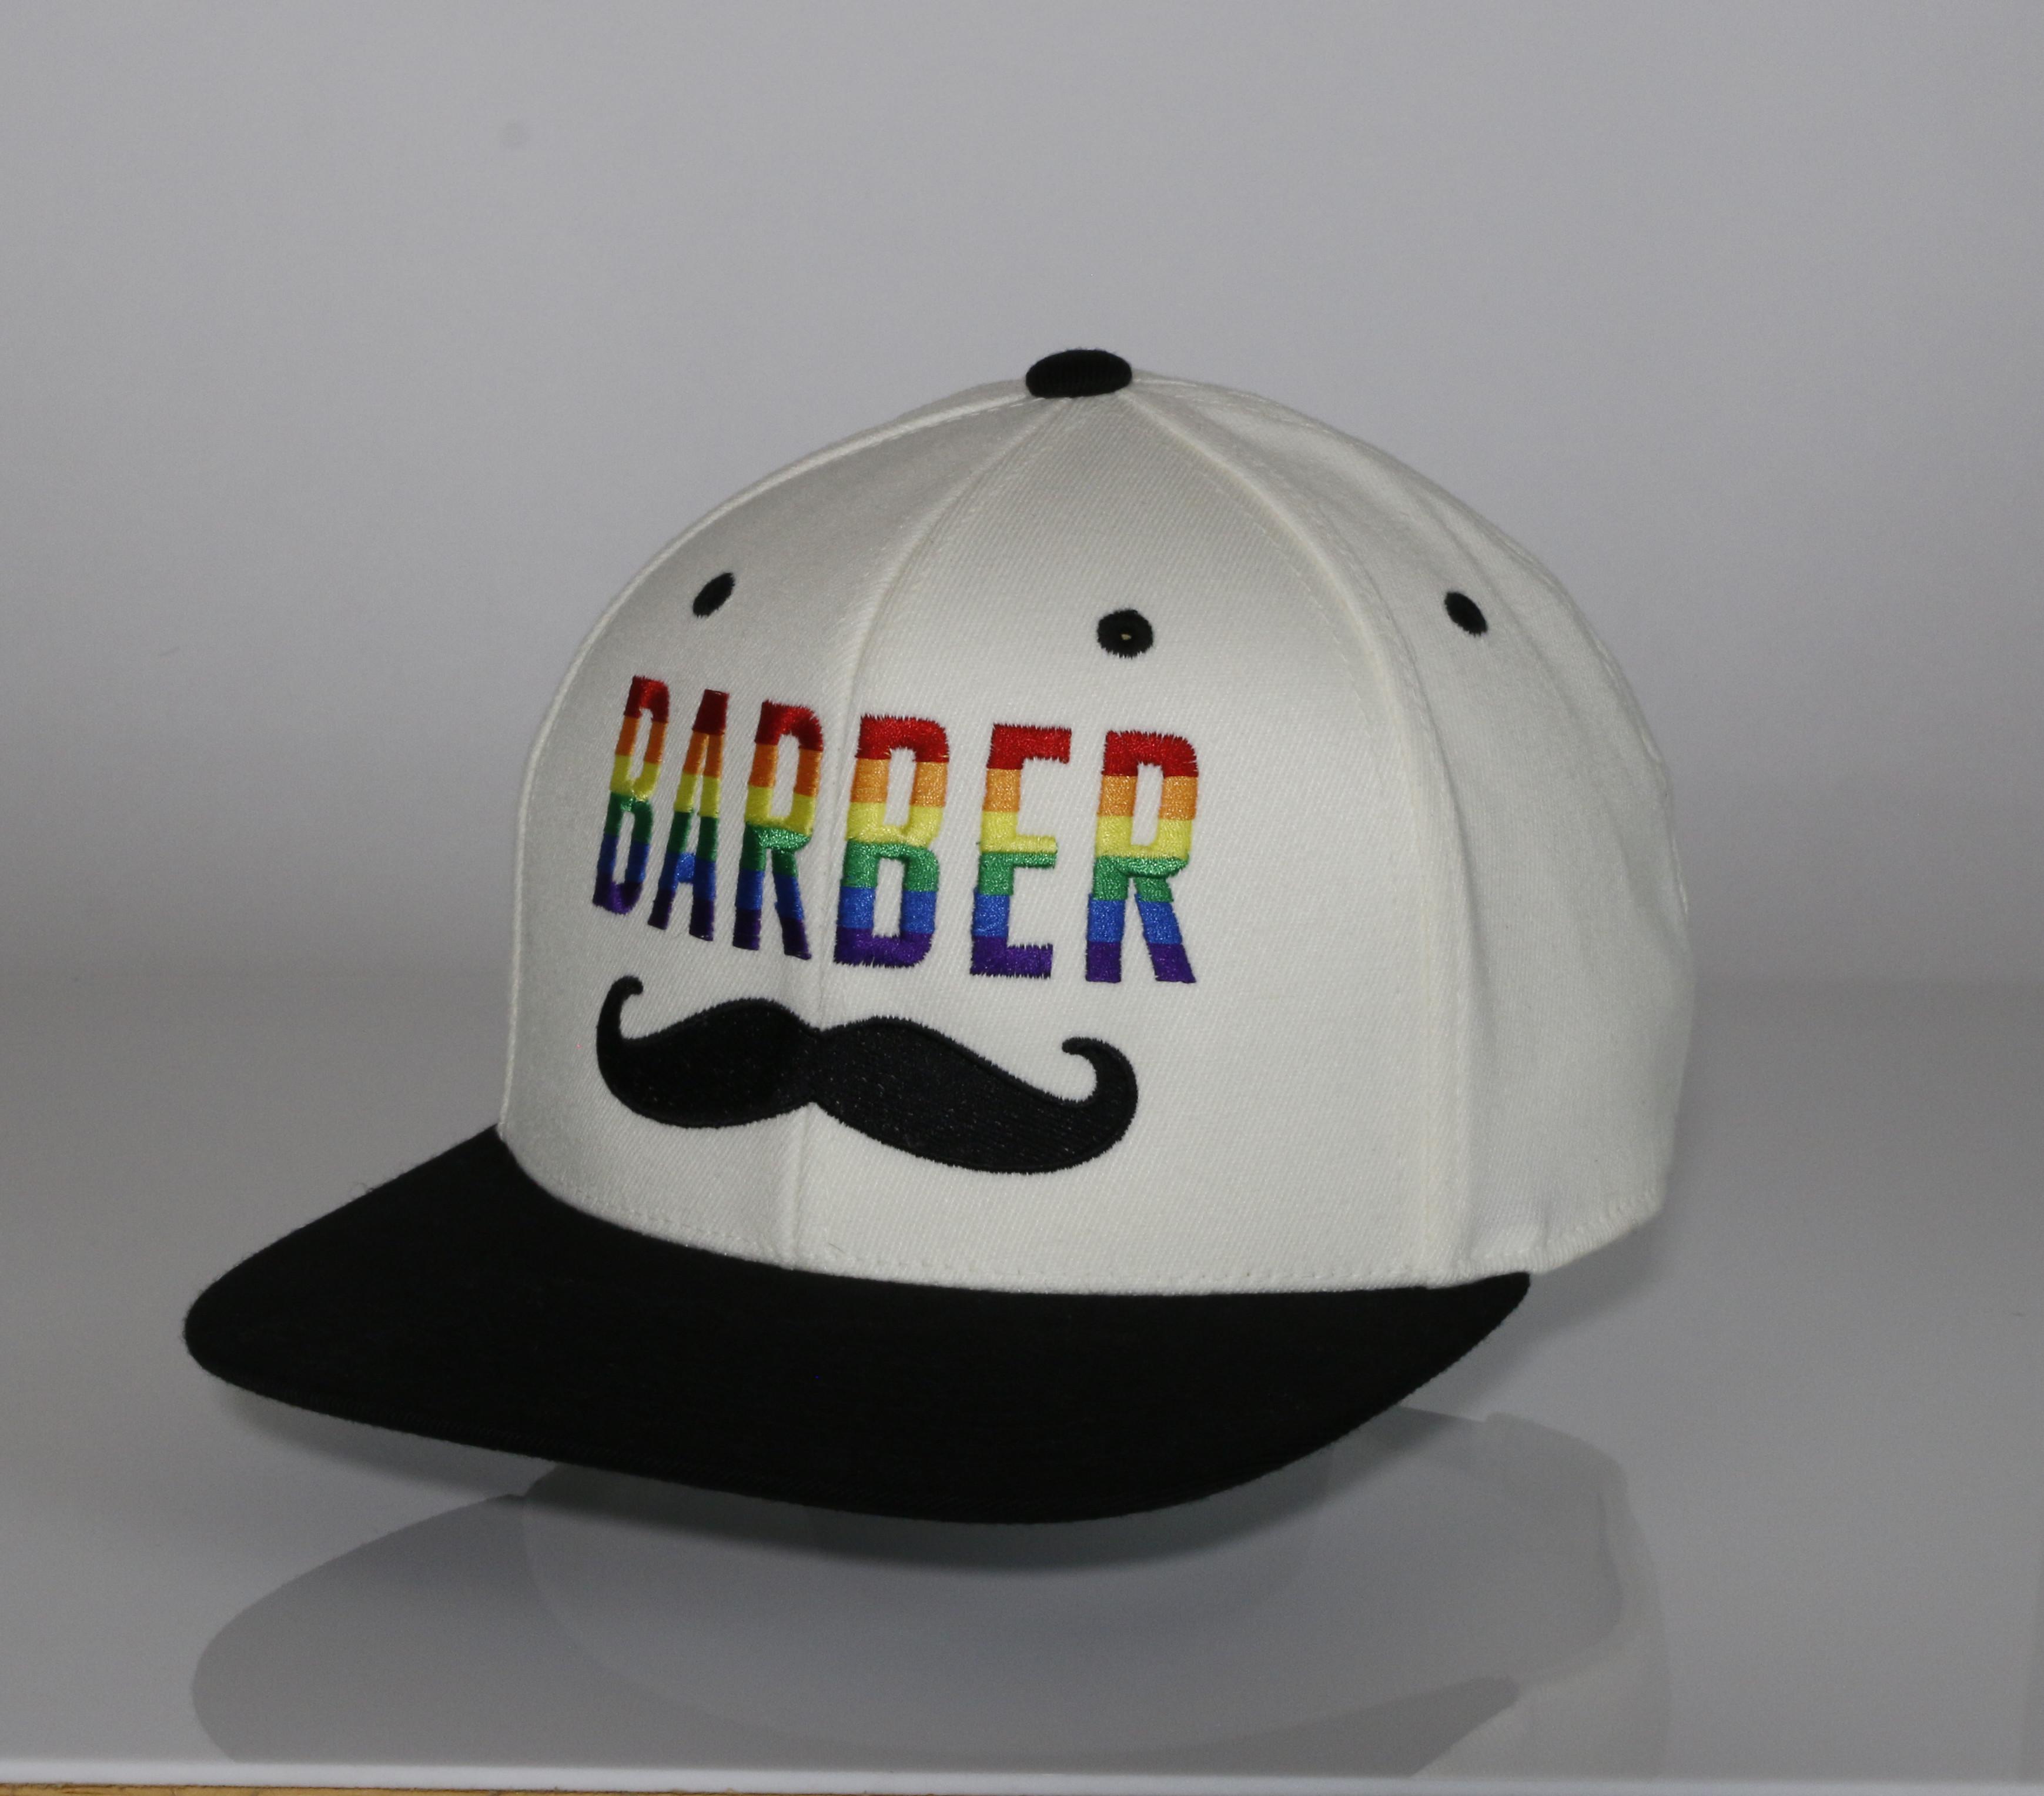 Rainbow barber mustache flexfit hat black jpg 3477x3055 Barber headgear 3ece33256961